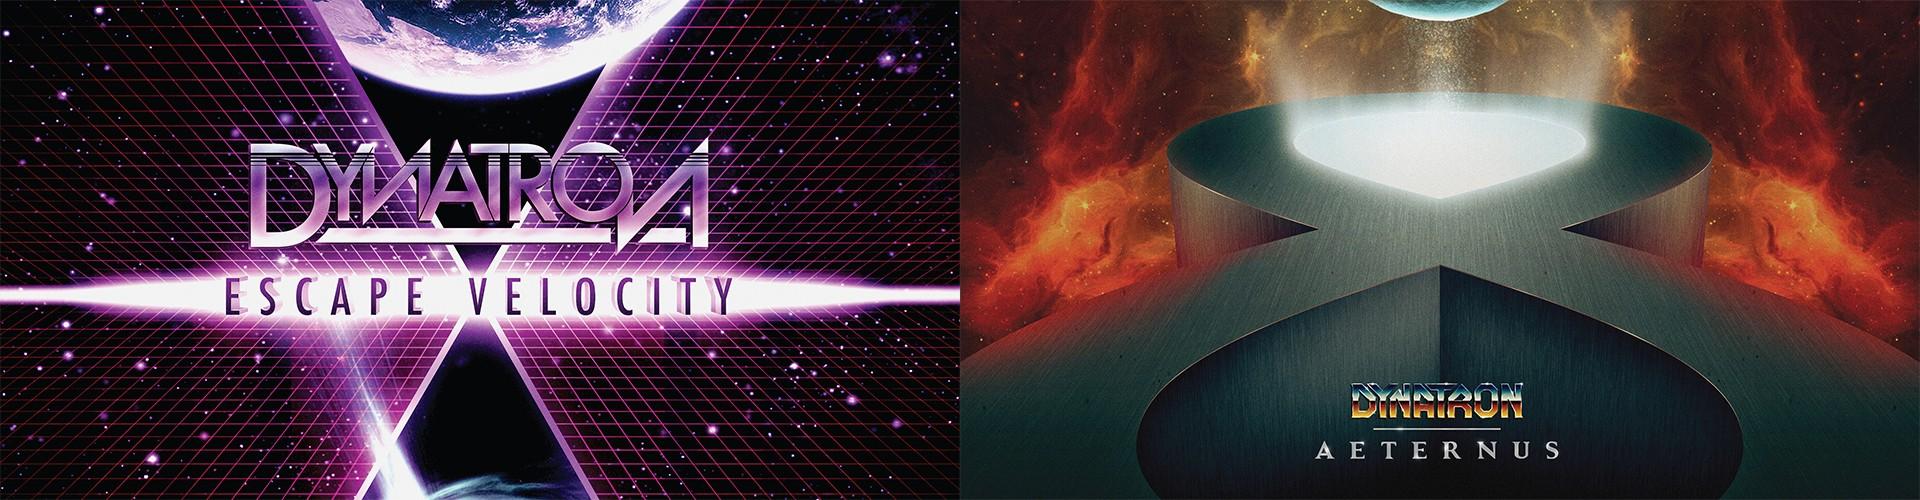 "Dynatron ""Escape Velocity"" + ""Aeternus"""